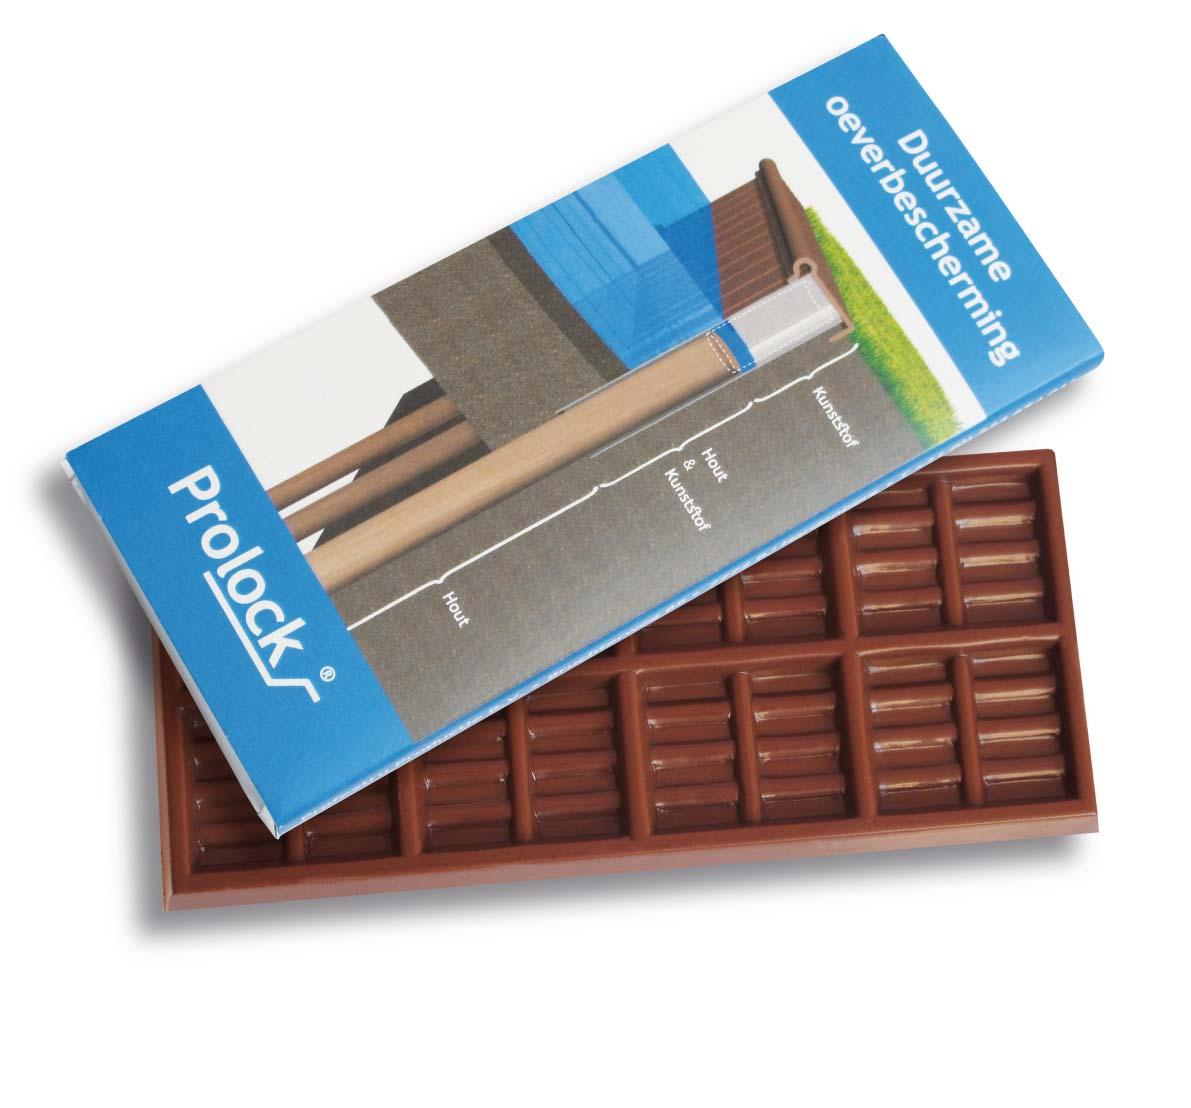 Čokoláda 50g se zalaminovaným rukávem